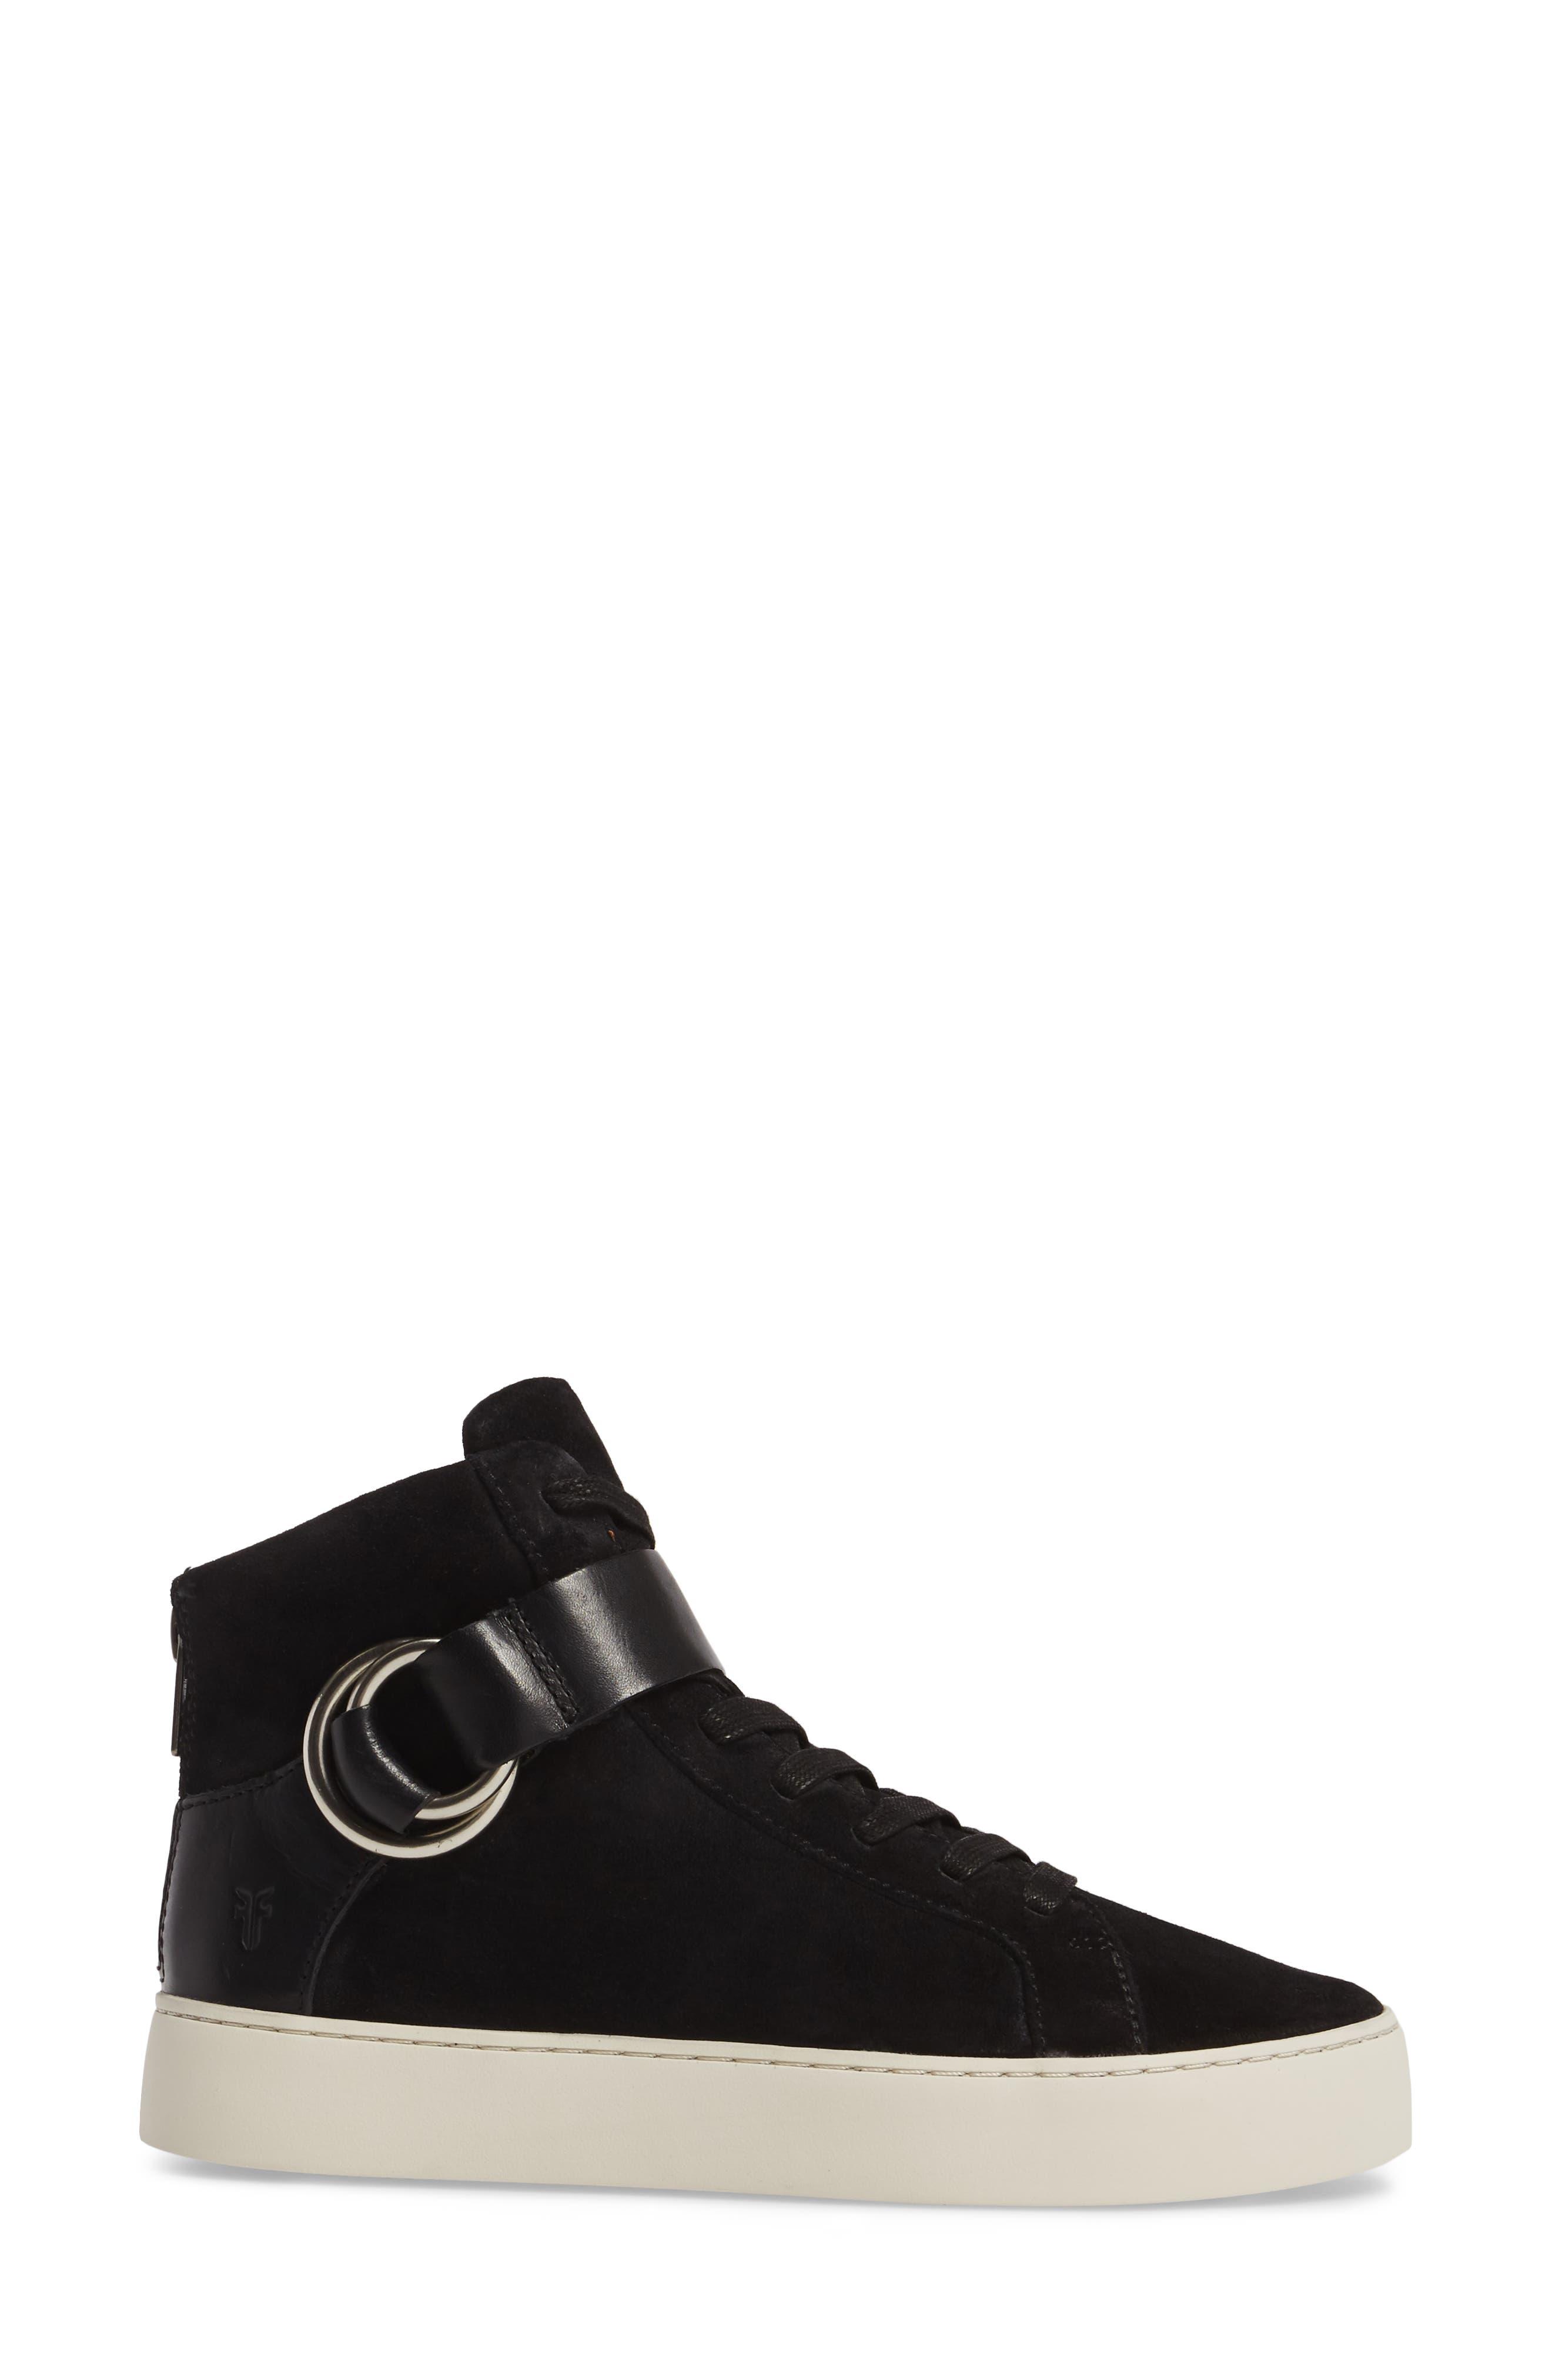 Lena Harness Sneaker,                             Alternate thumbnail 3, color,                             Black